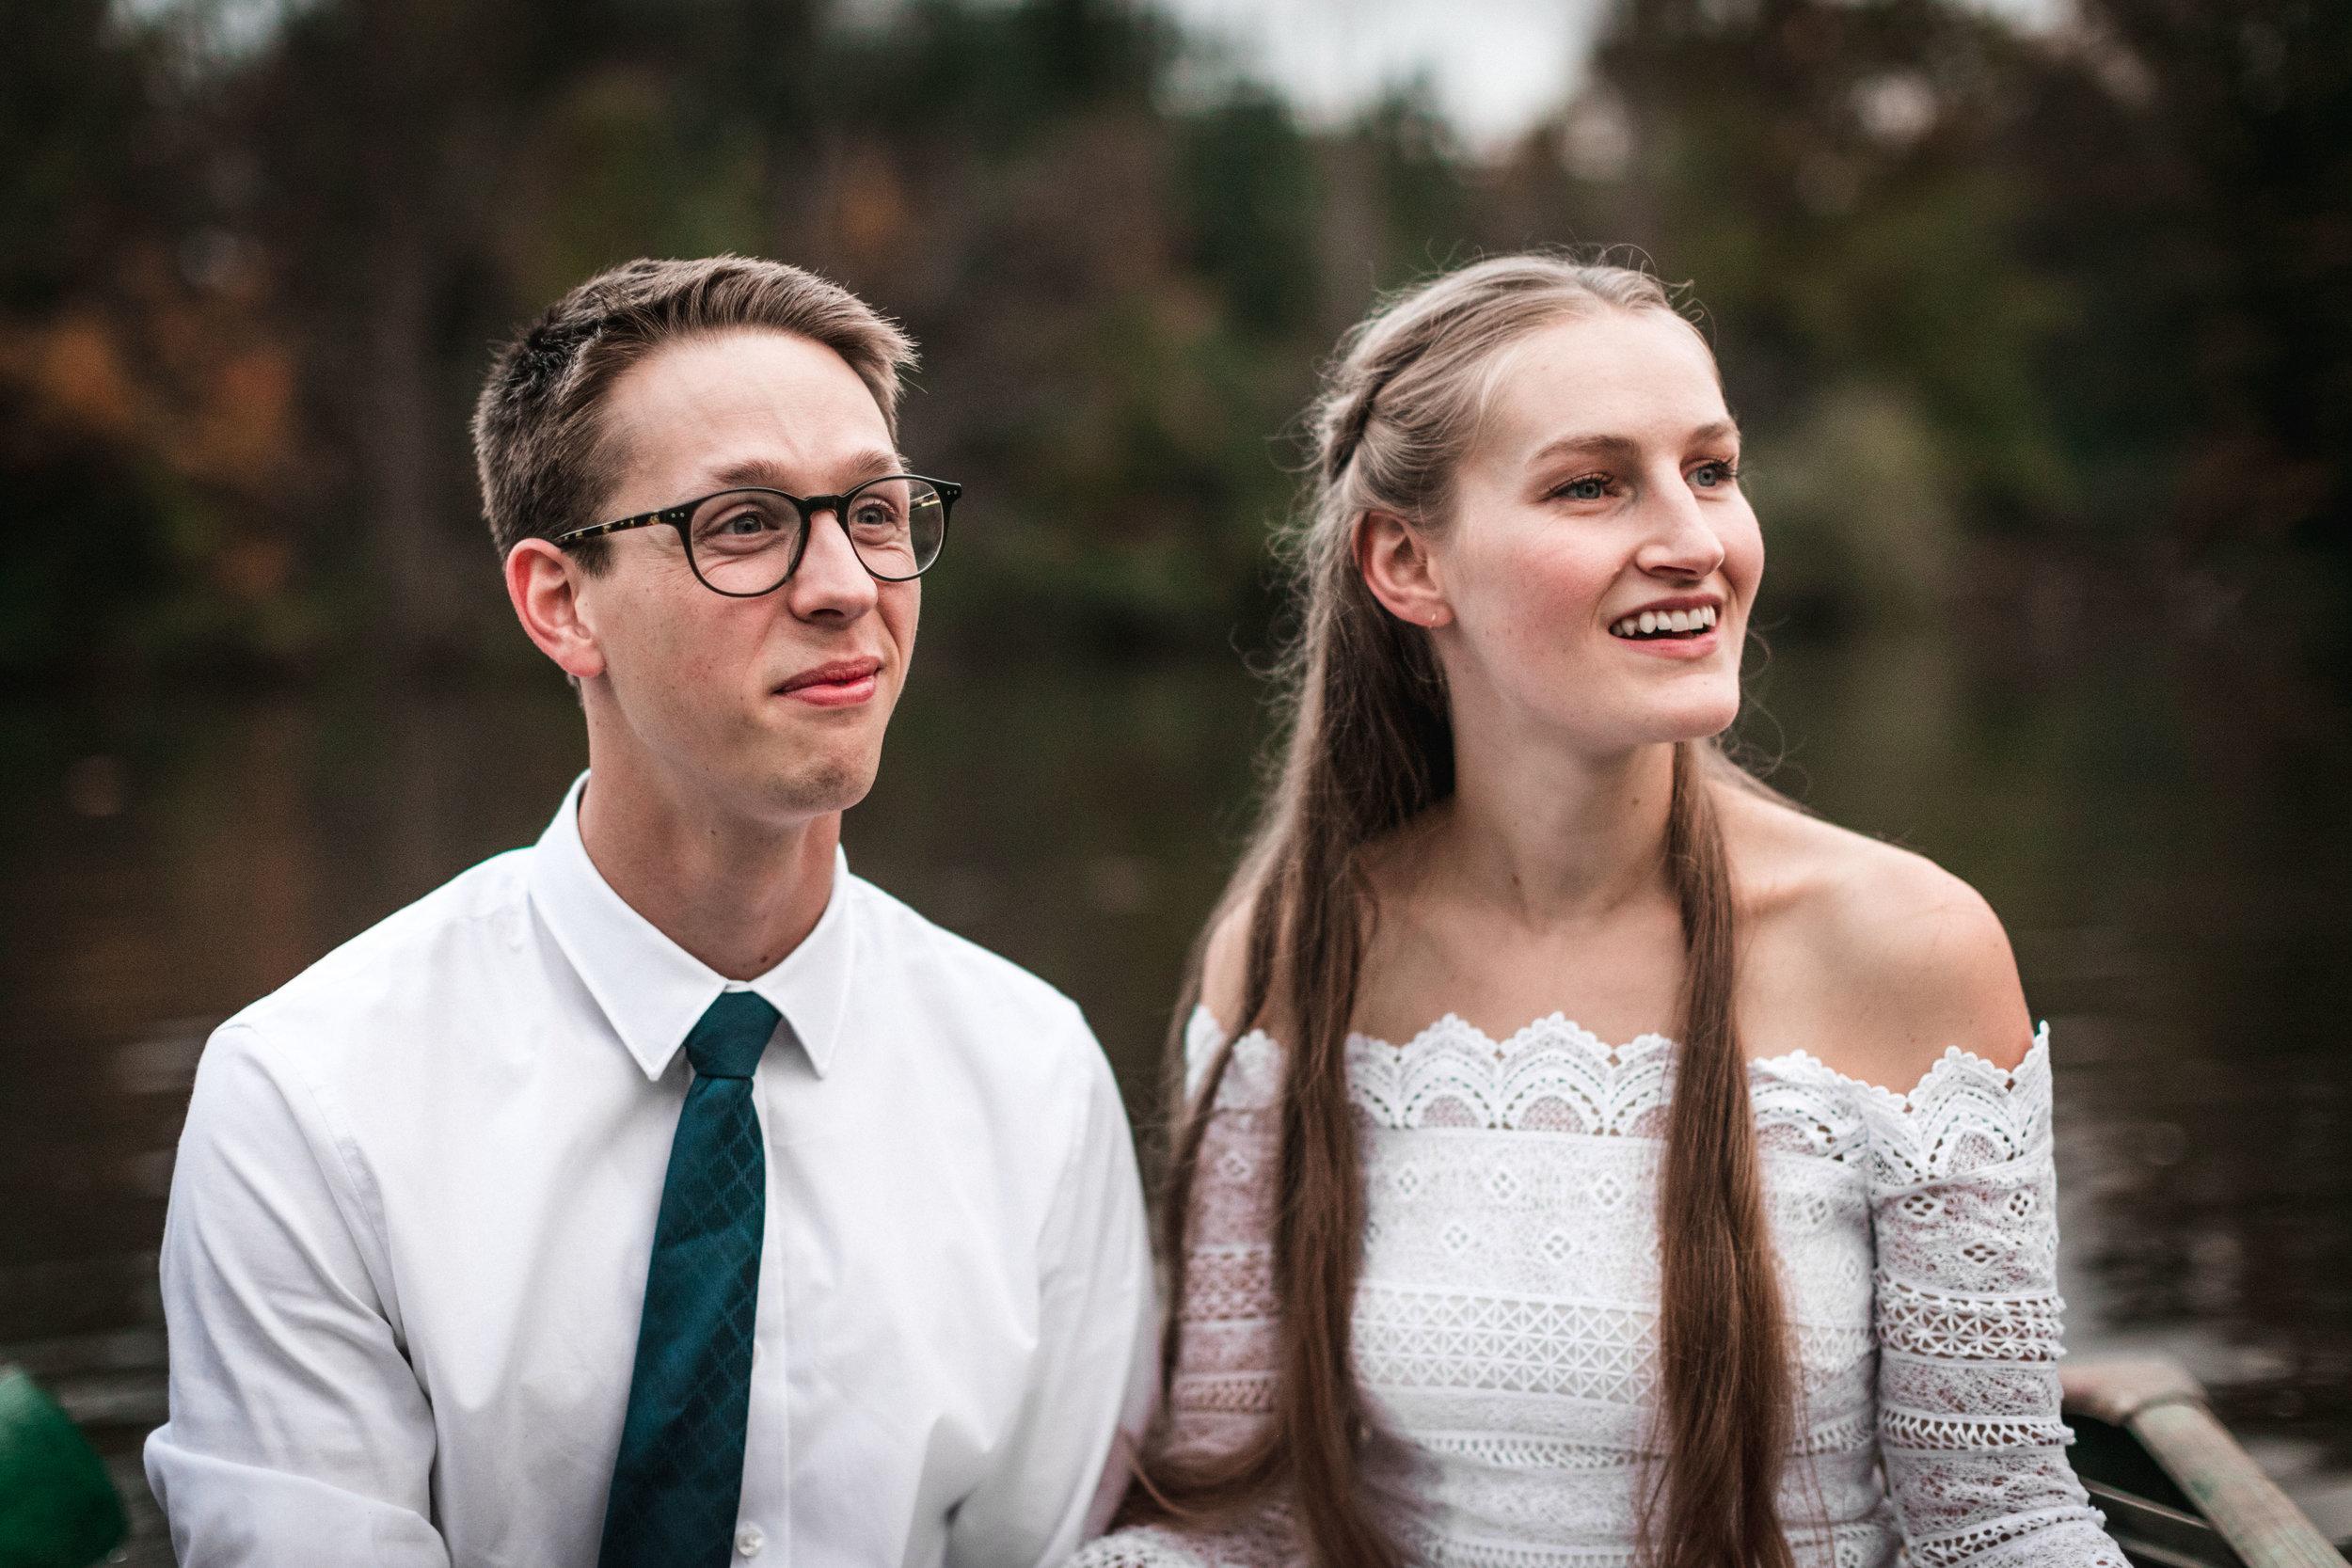 vild-photography-photographer-tahoe-intimate-wedding-adventure-van-abigail-301.jpg